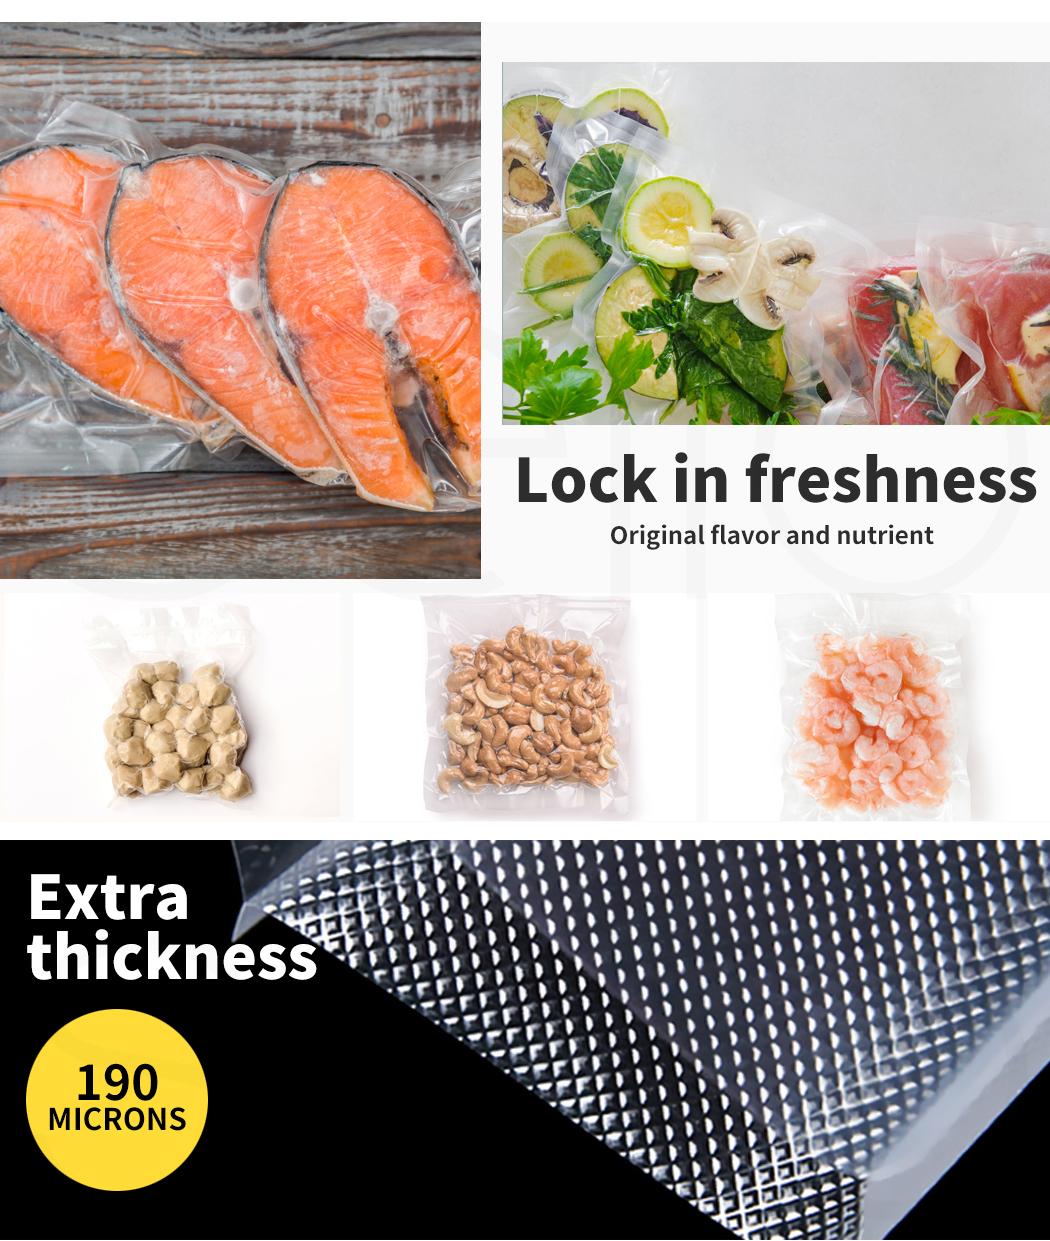 thumbnail 16 - Vacuum Food Sealer Storage Bags Saver Seal Bags Commercial Heat 100/200/500x